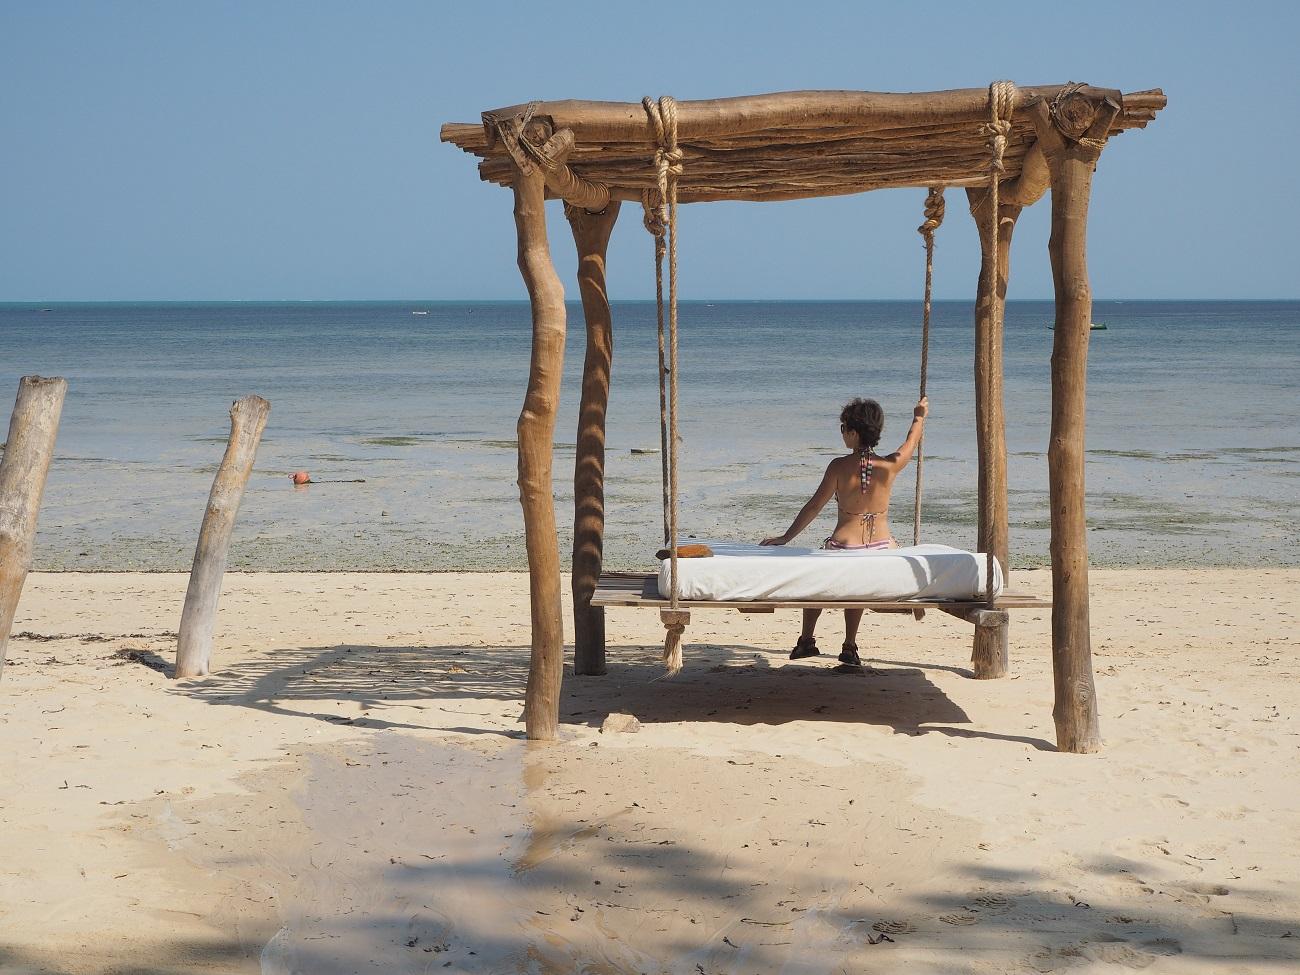 4. kép: Madagaszkár